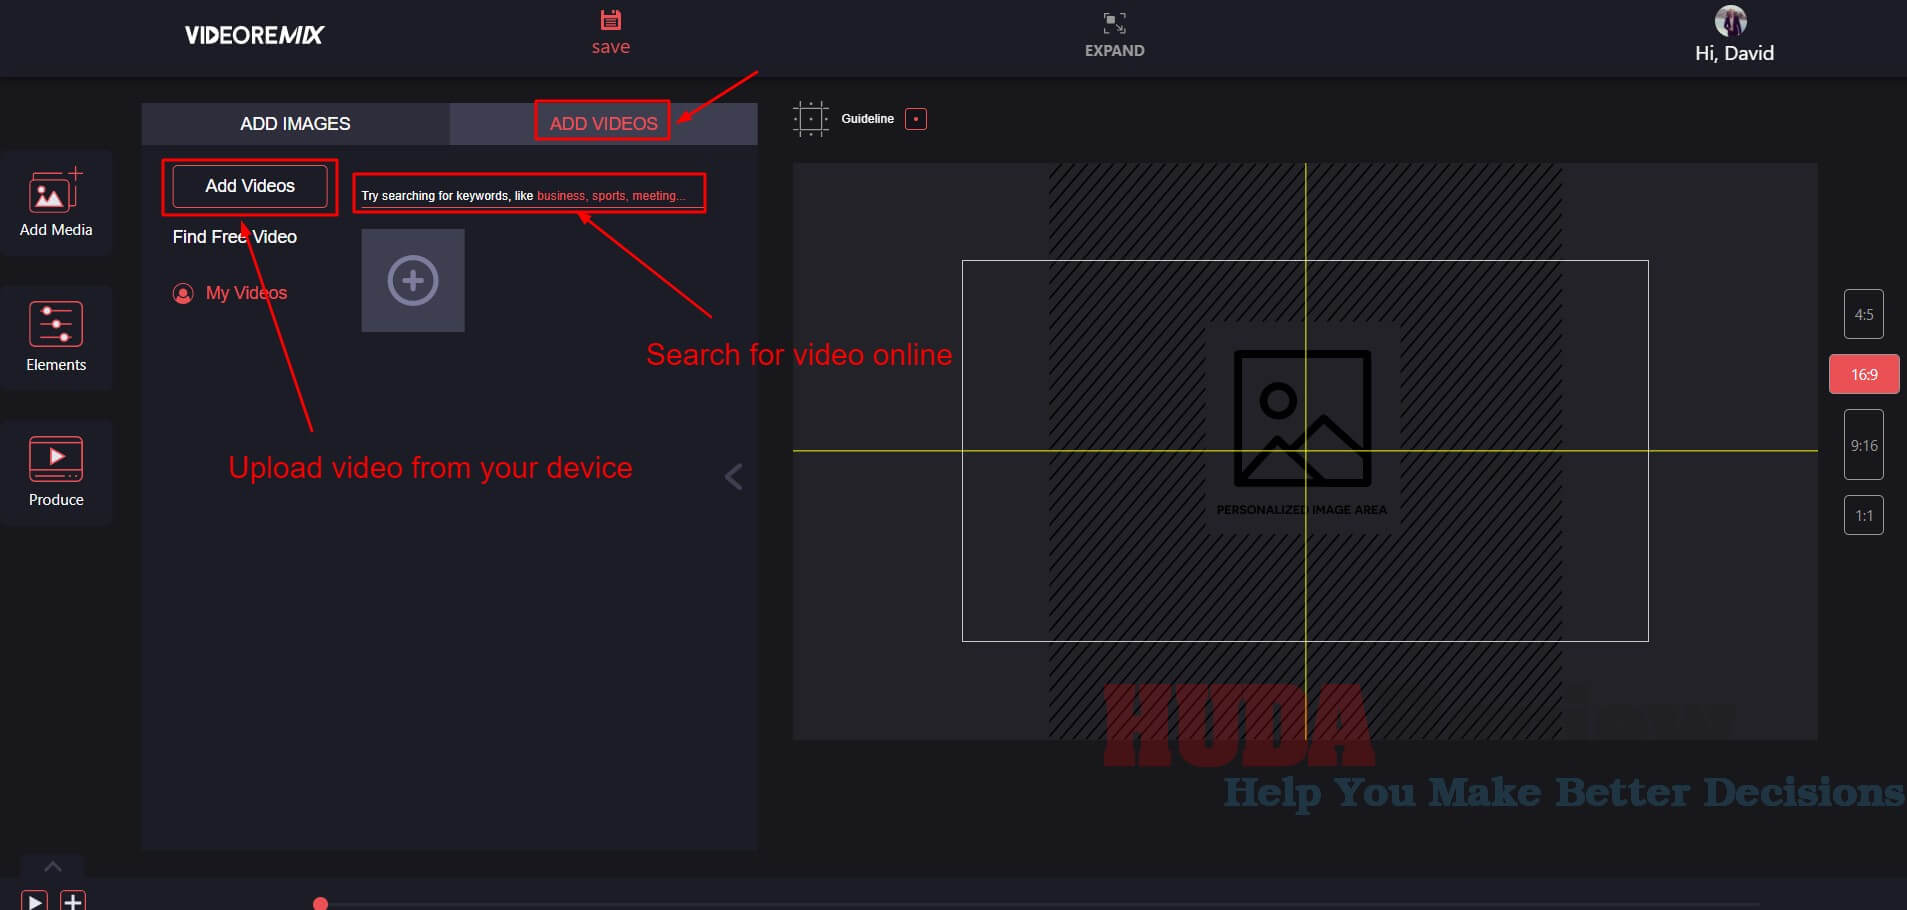 Smart-Video-Revolution-Step-1-3